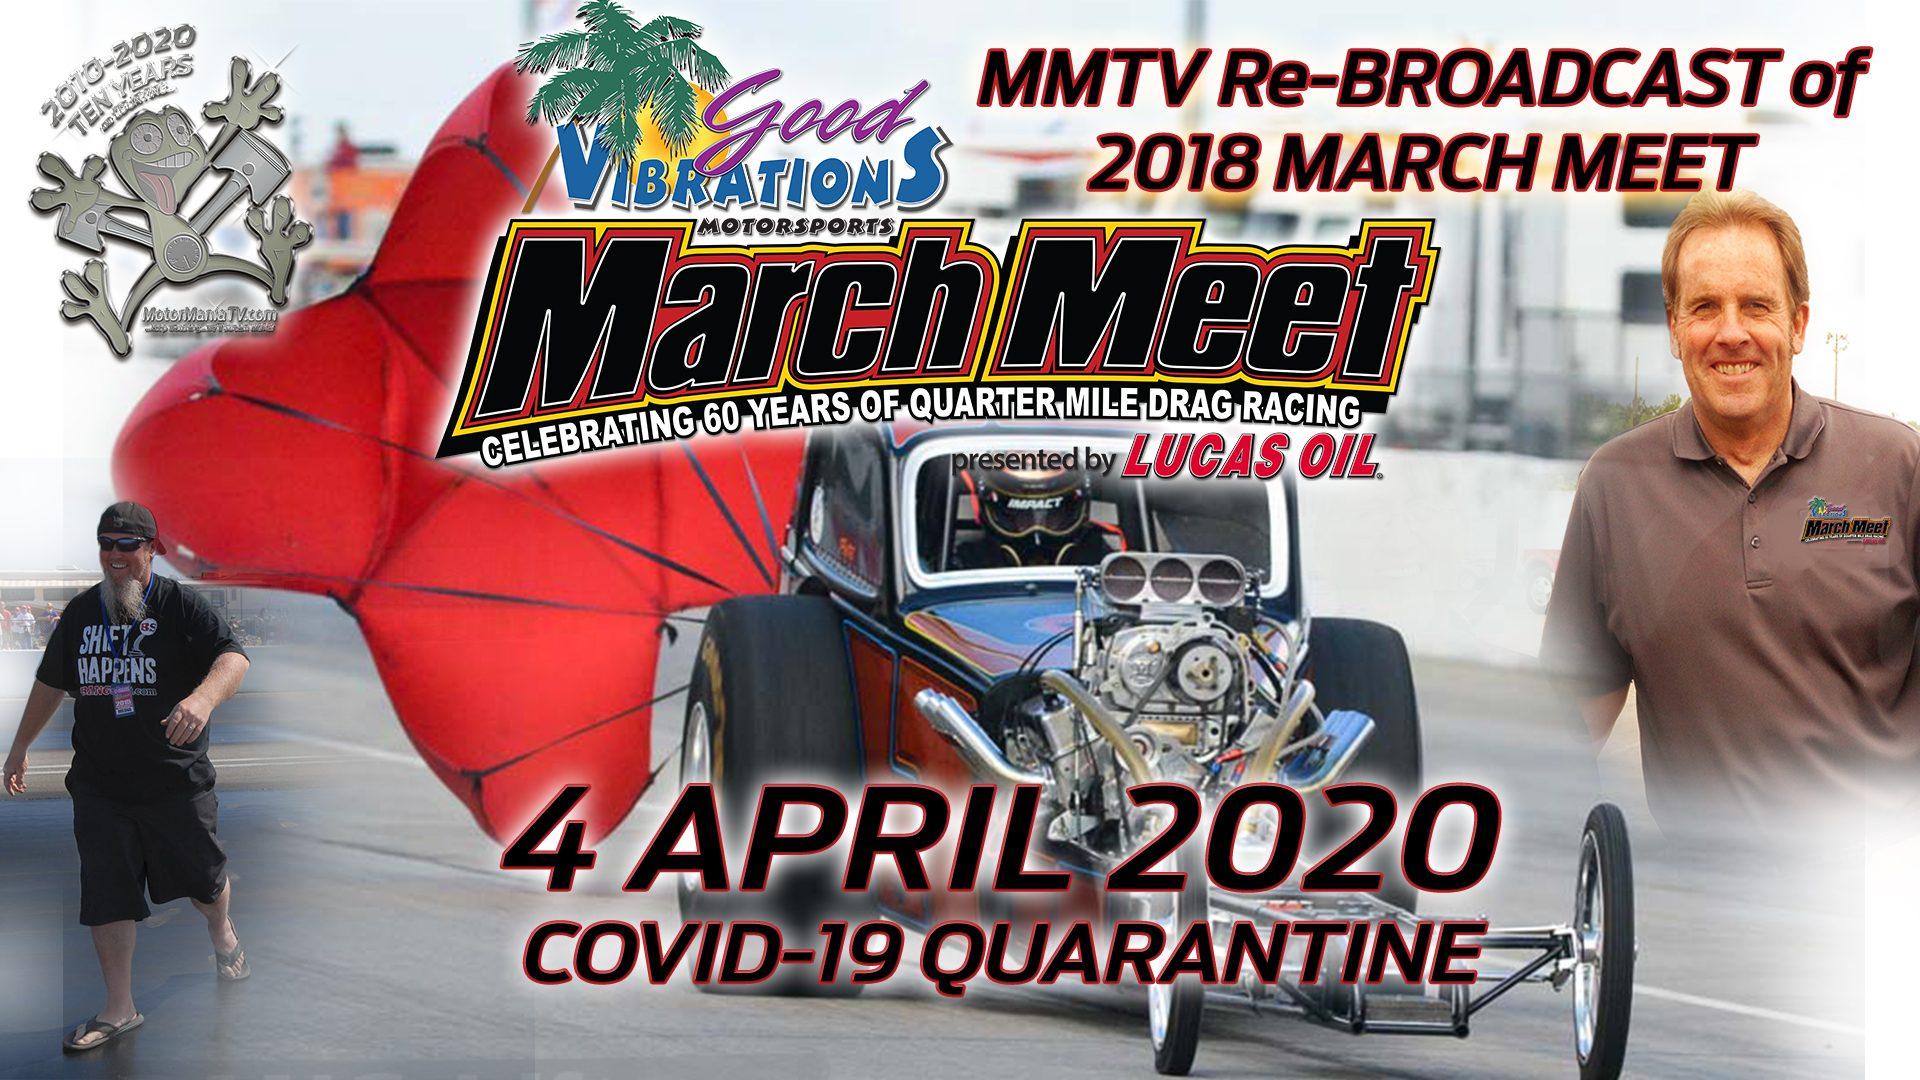 MarchMeet 2018 ReBroadcast